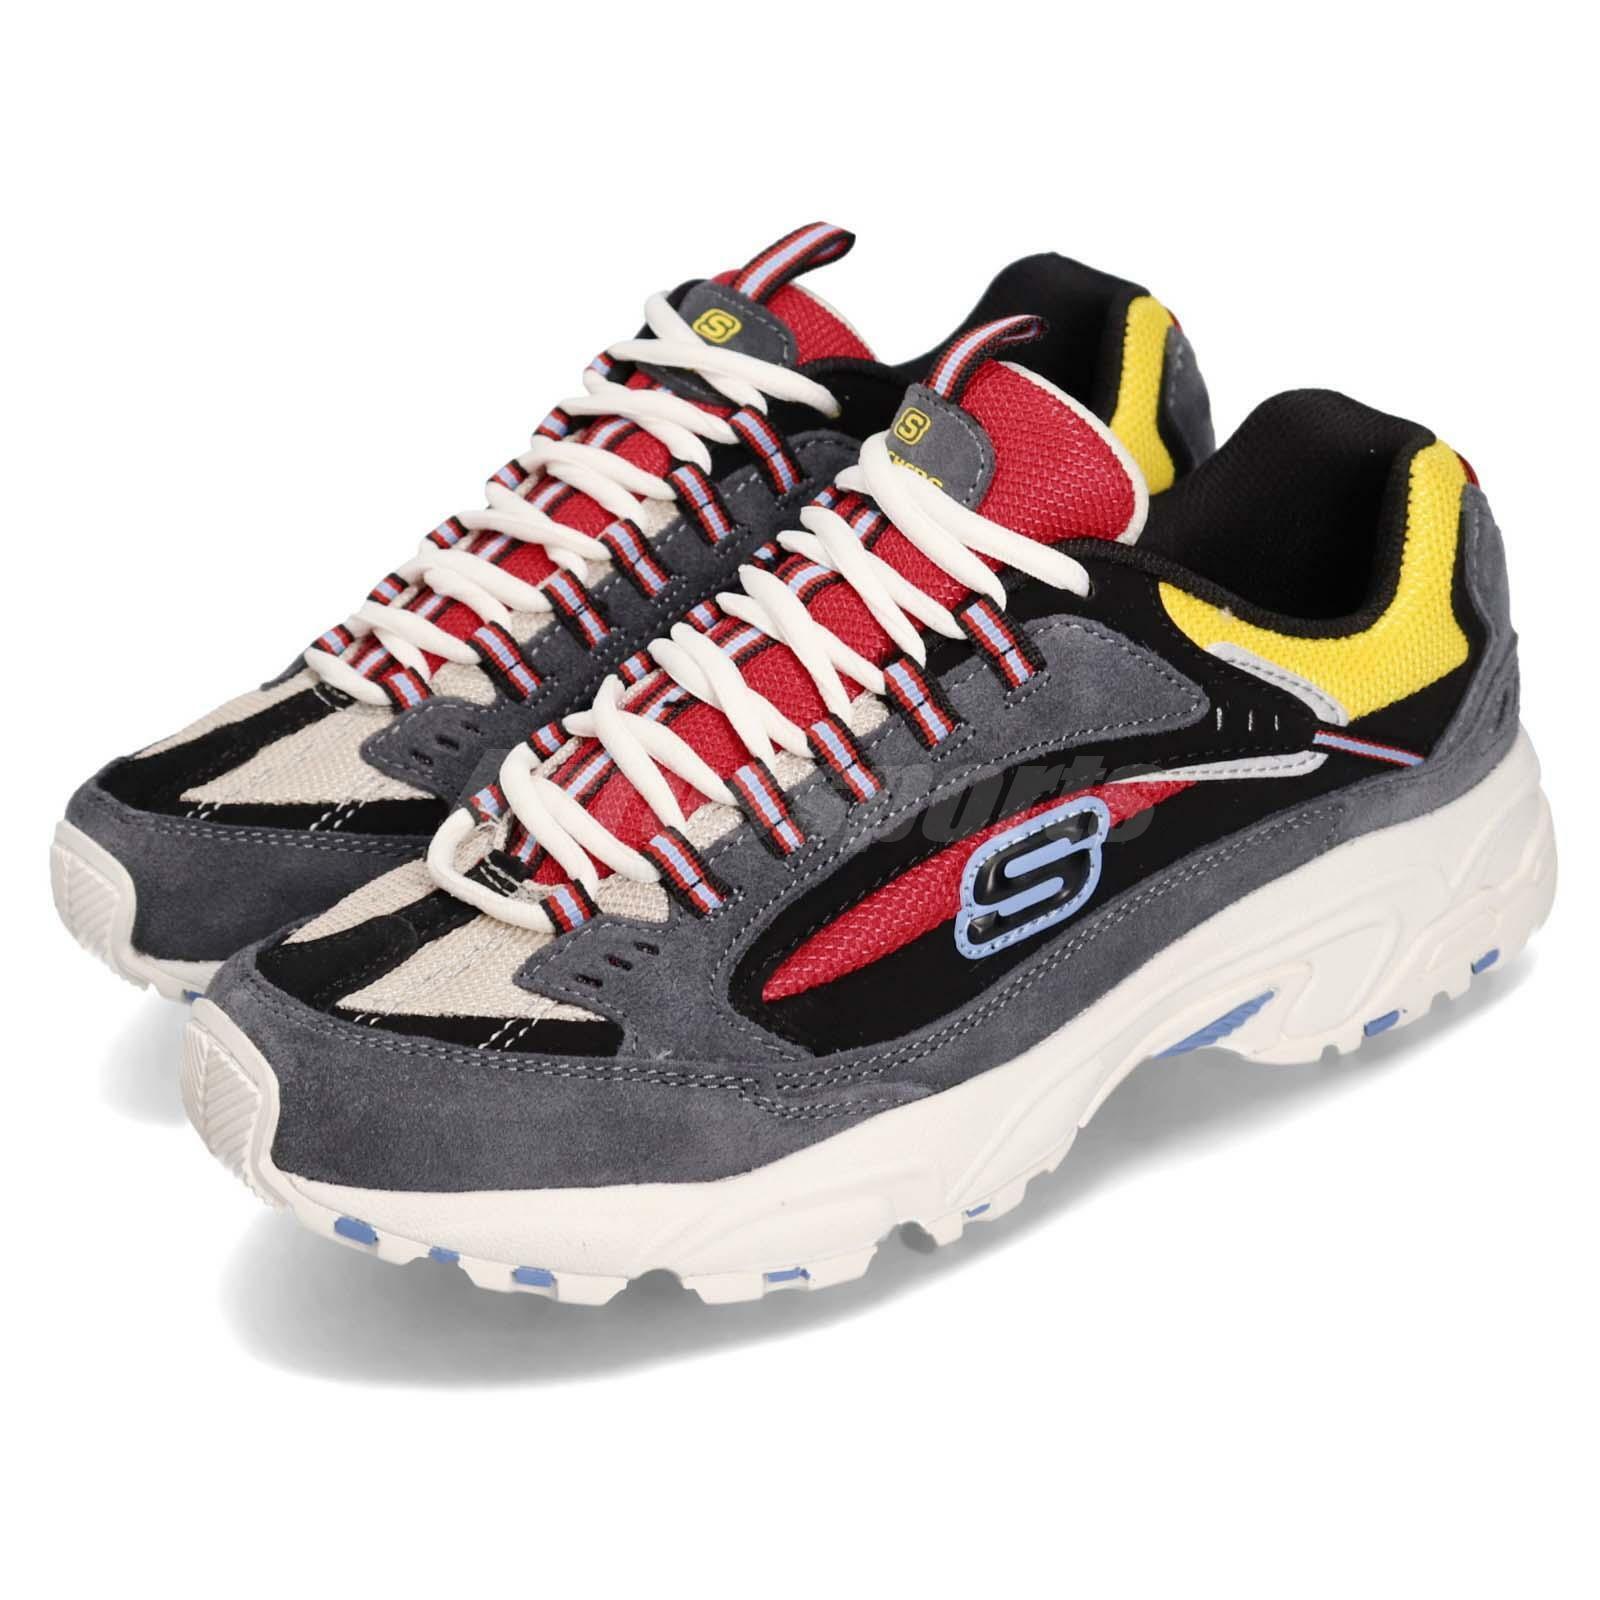 Skechers Stamina-Cutback gris rojo amarillo negro Men Lifestyle zapatos 51286-CCRD